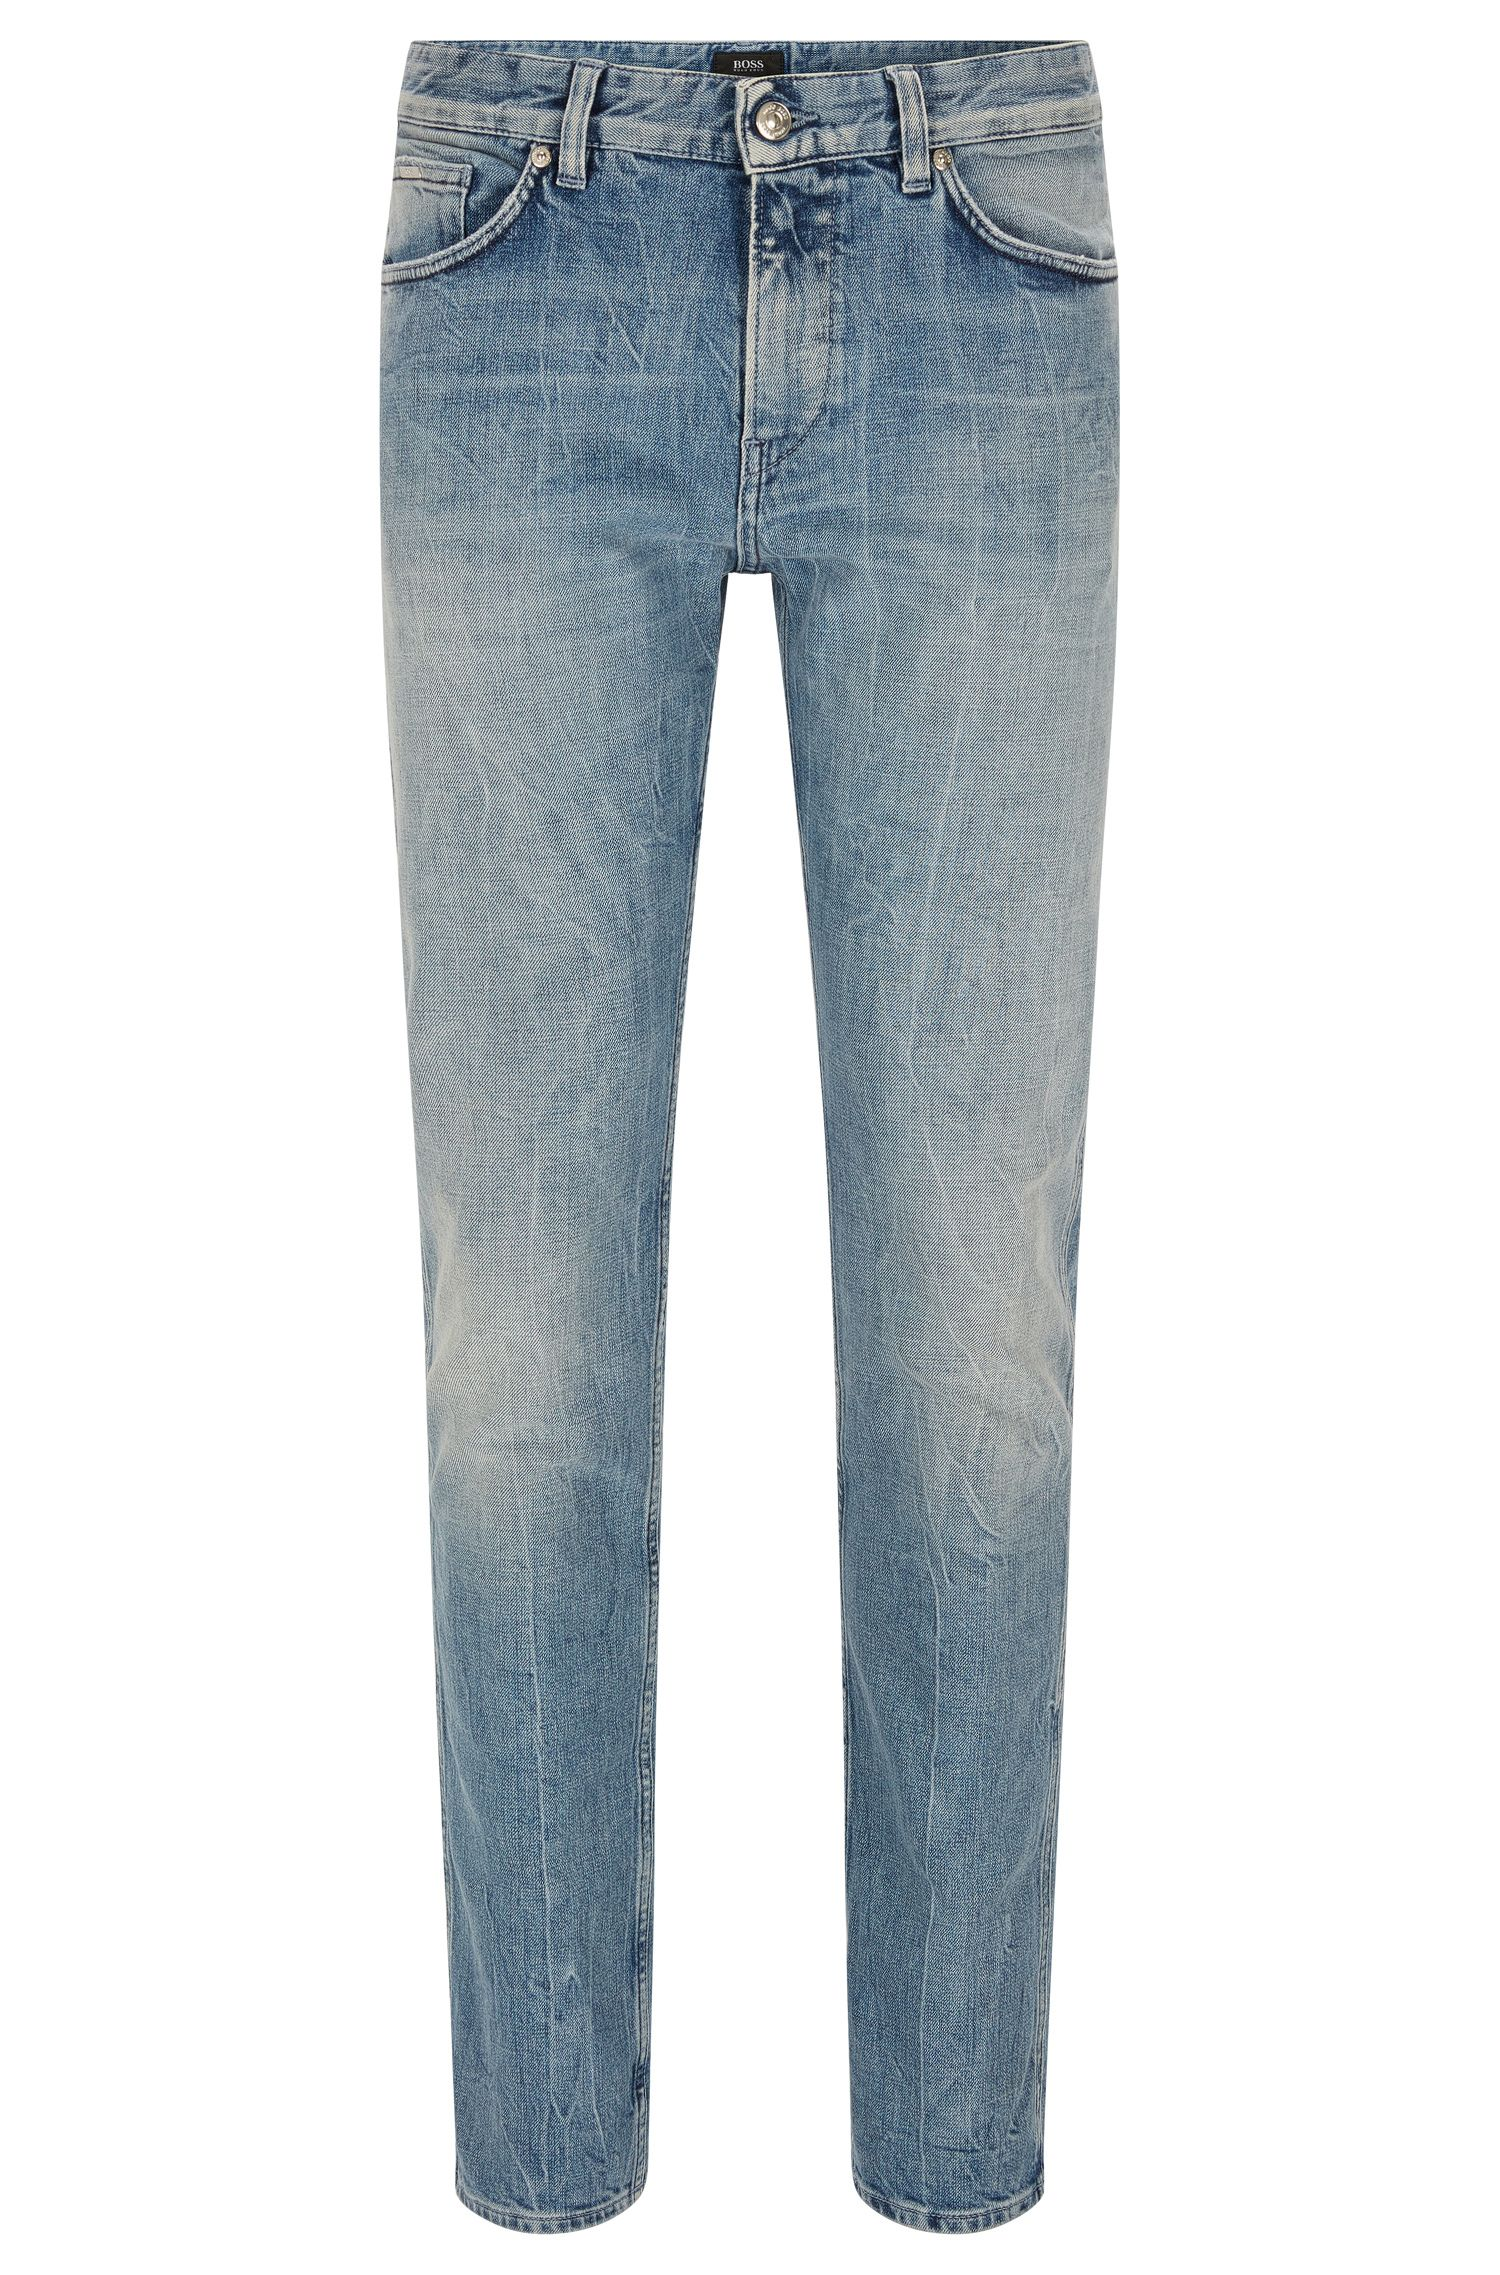 'Delaware'   Slim Fit, 12 oz Stretch Cotton Jeans